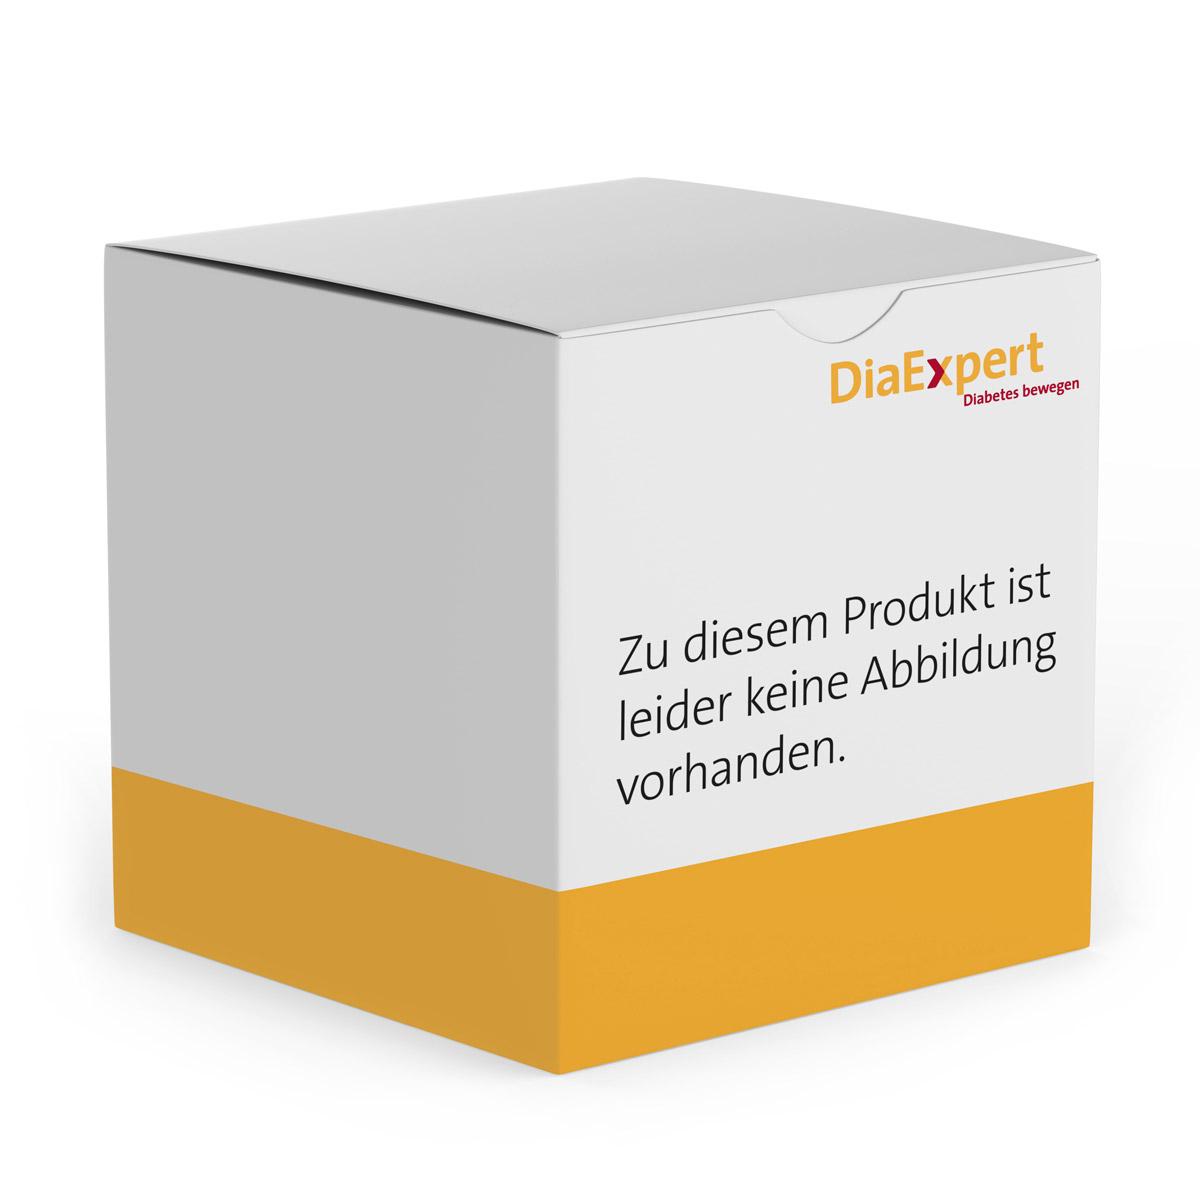 Traubenzucker-Würfel Apfel DiaExpert 1 Beutel à 50 Stück